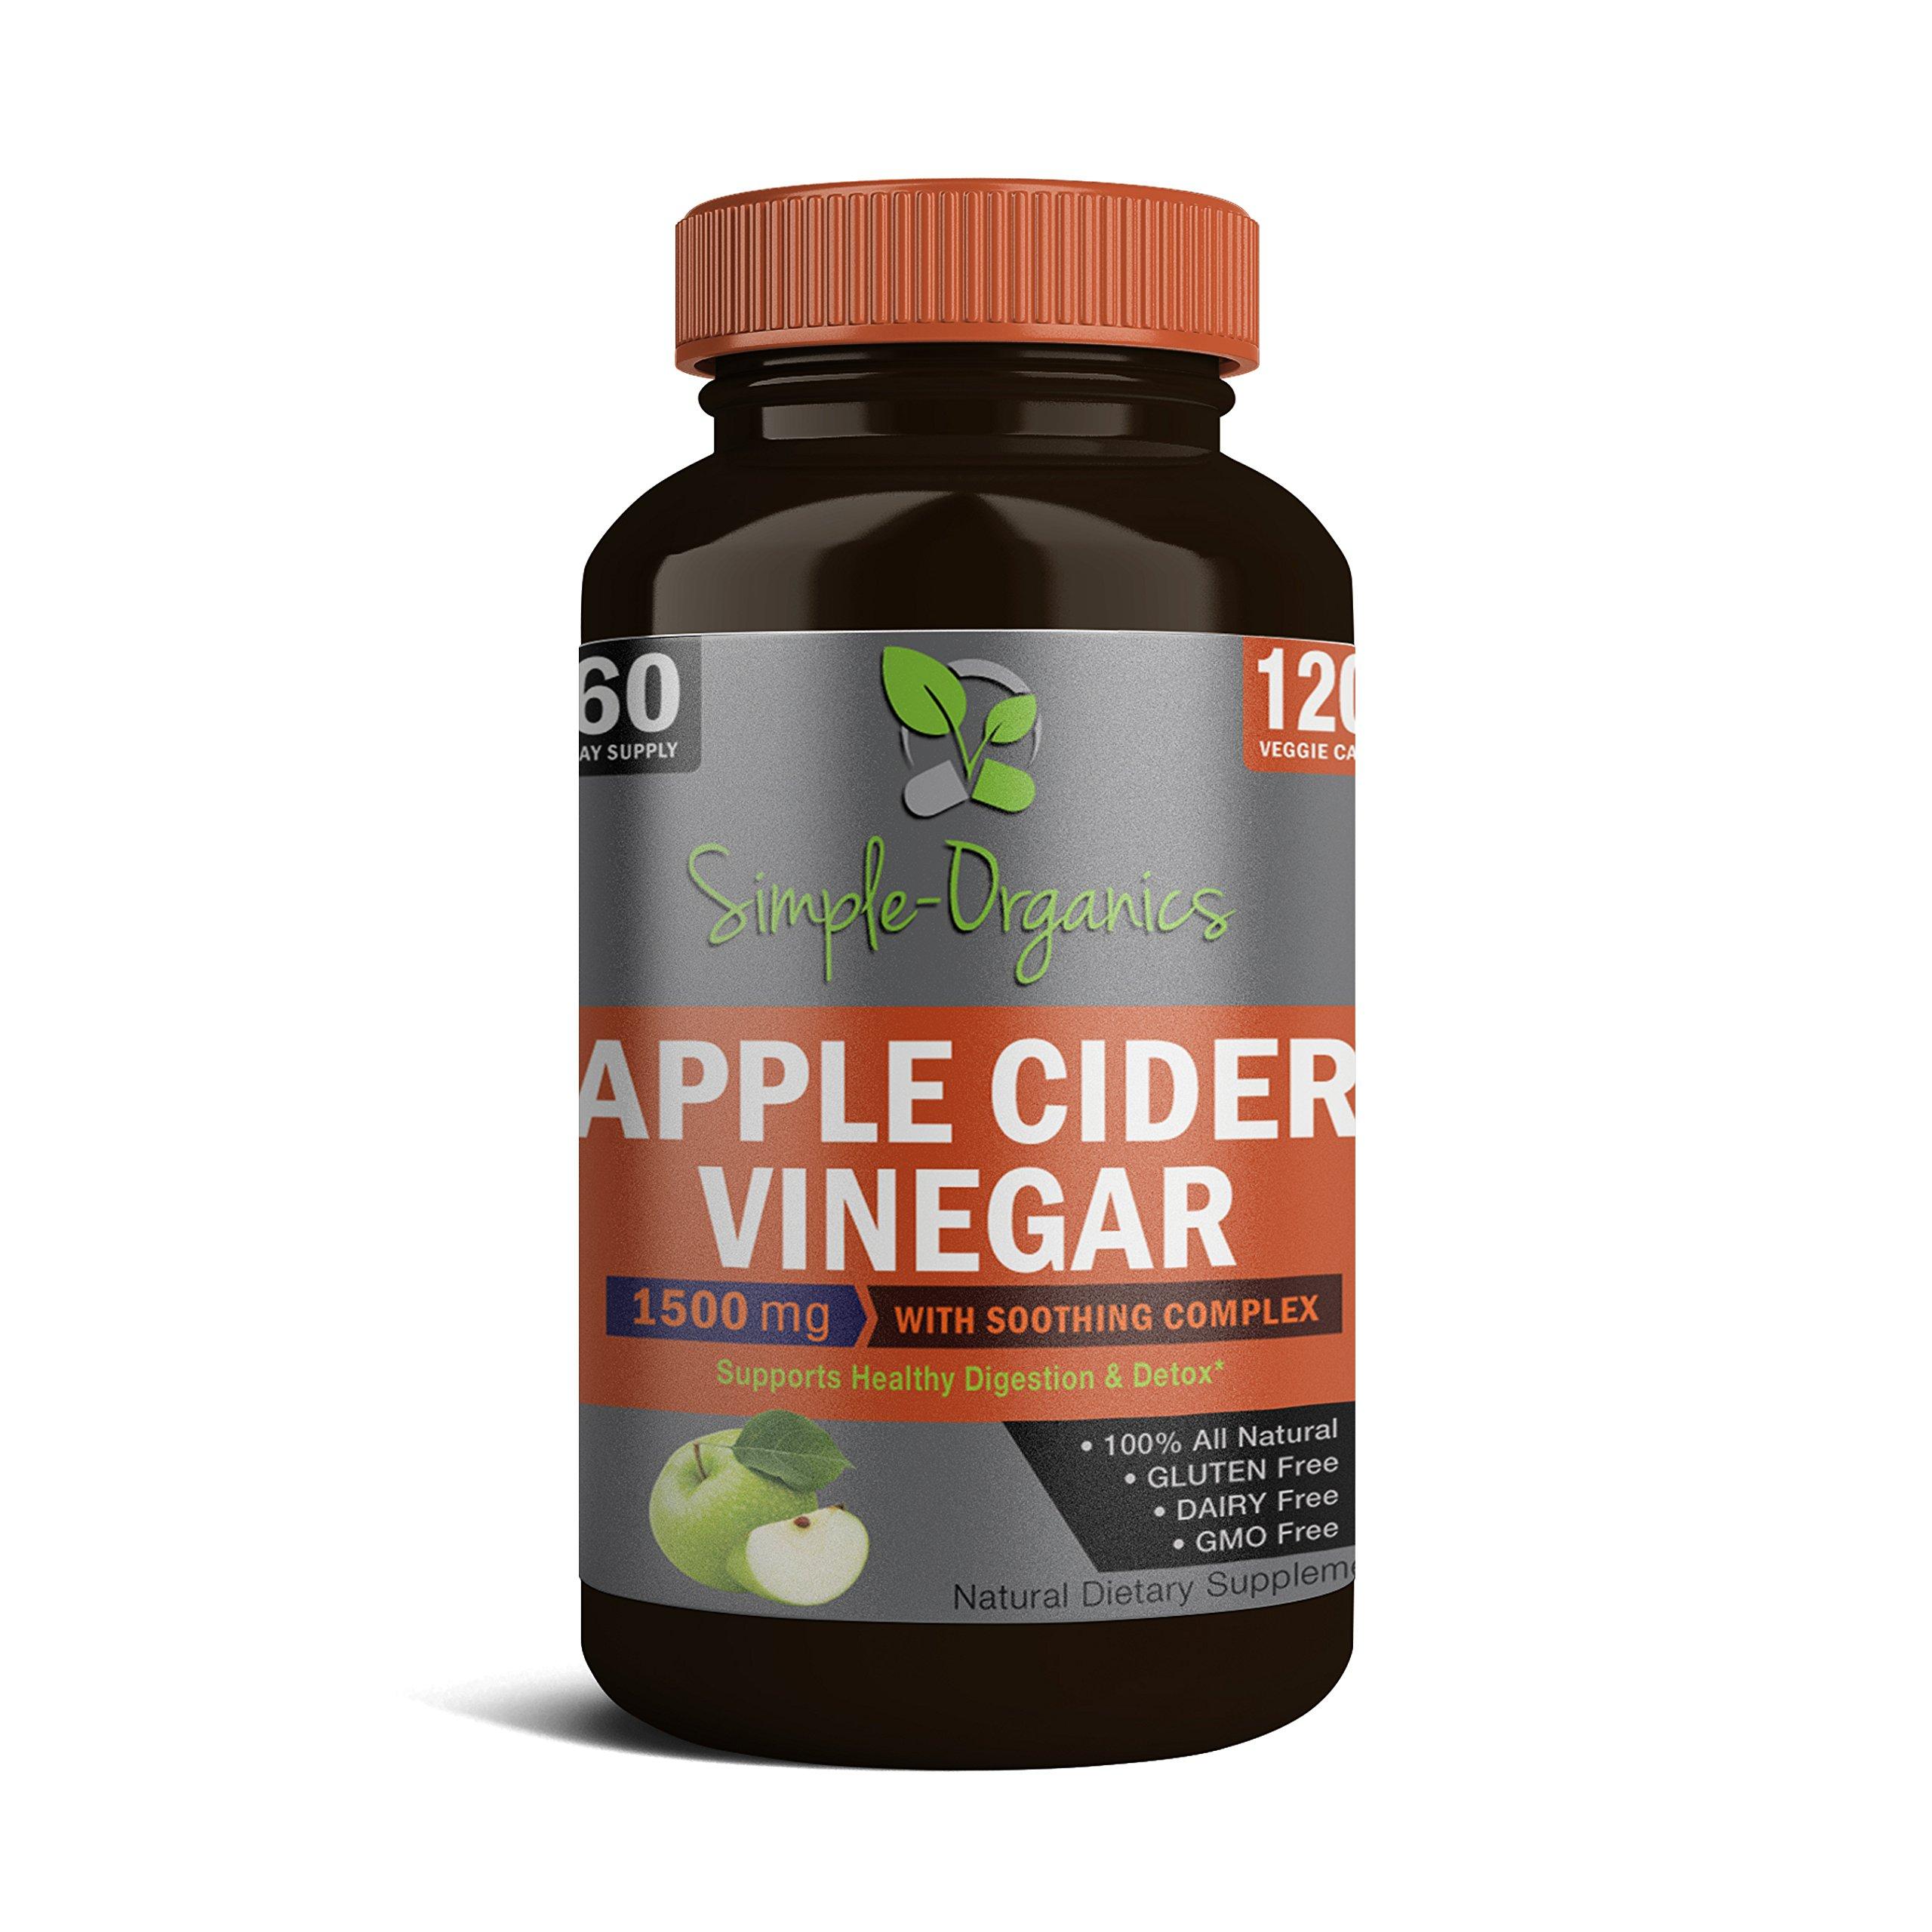 Organic Apple Cider Vinegar - Premium strength 1,630mg 100% Natural Weight Loss, Detox, Blood Sugar and Digestion Support, 120 Vegan capsules